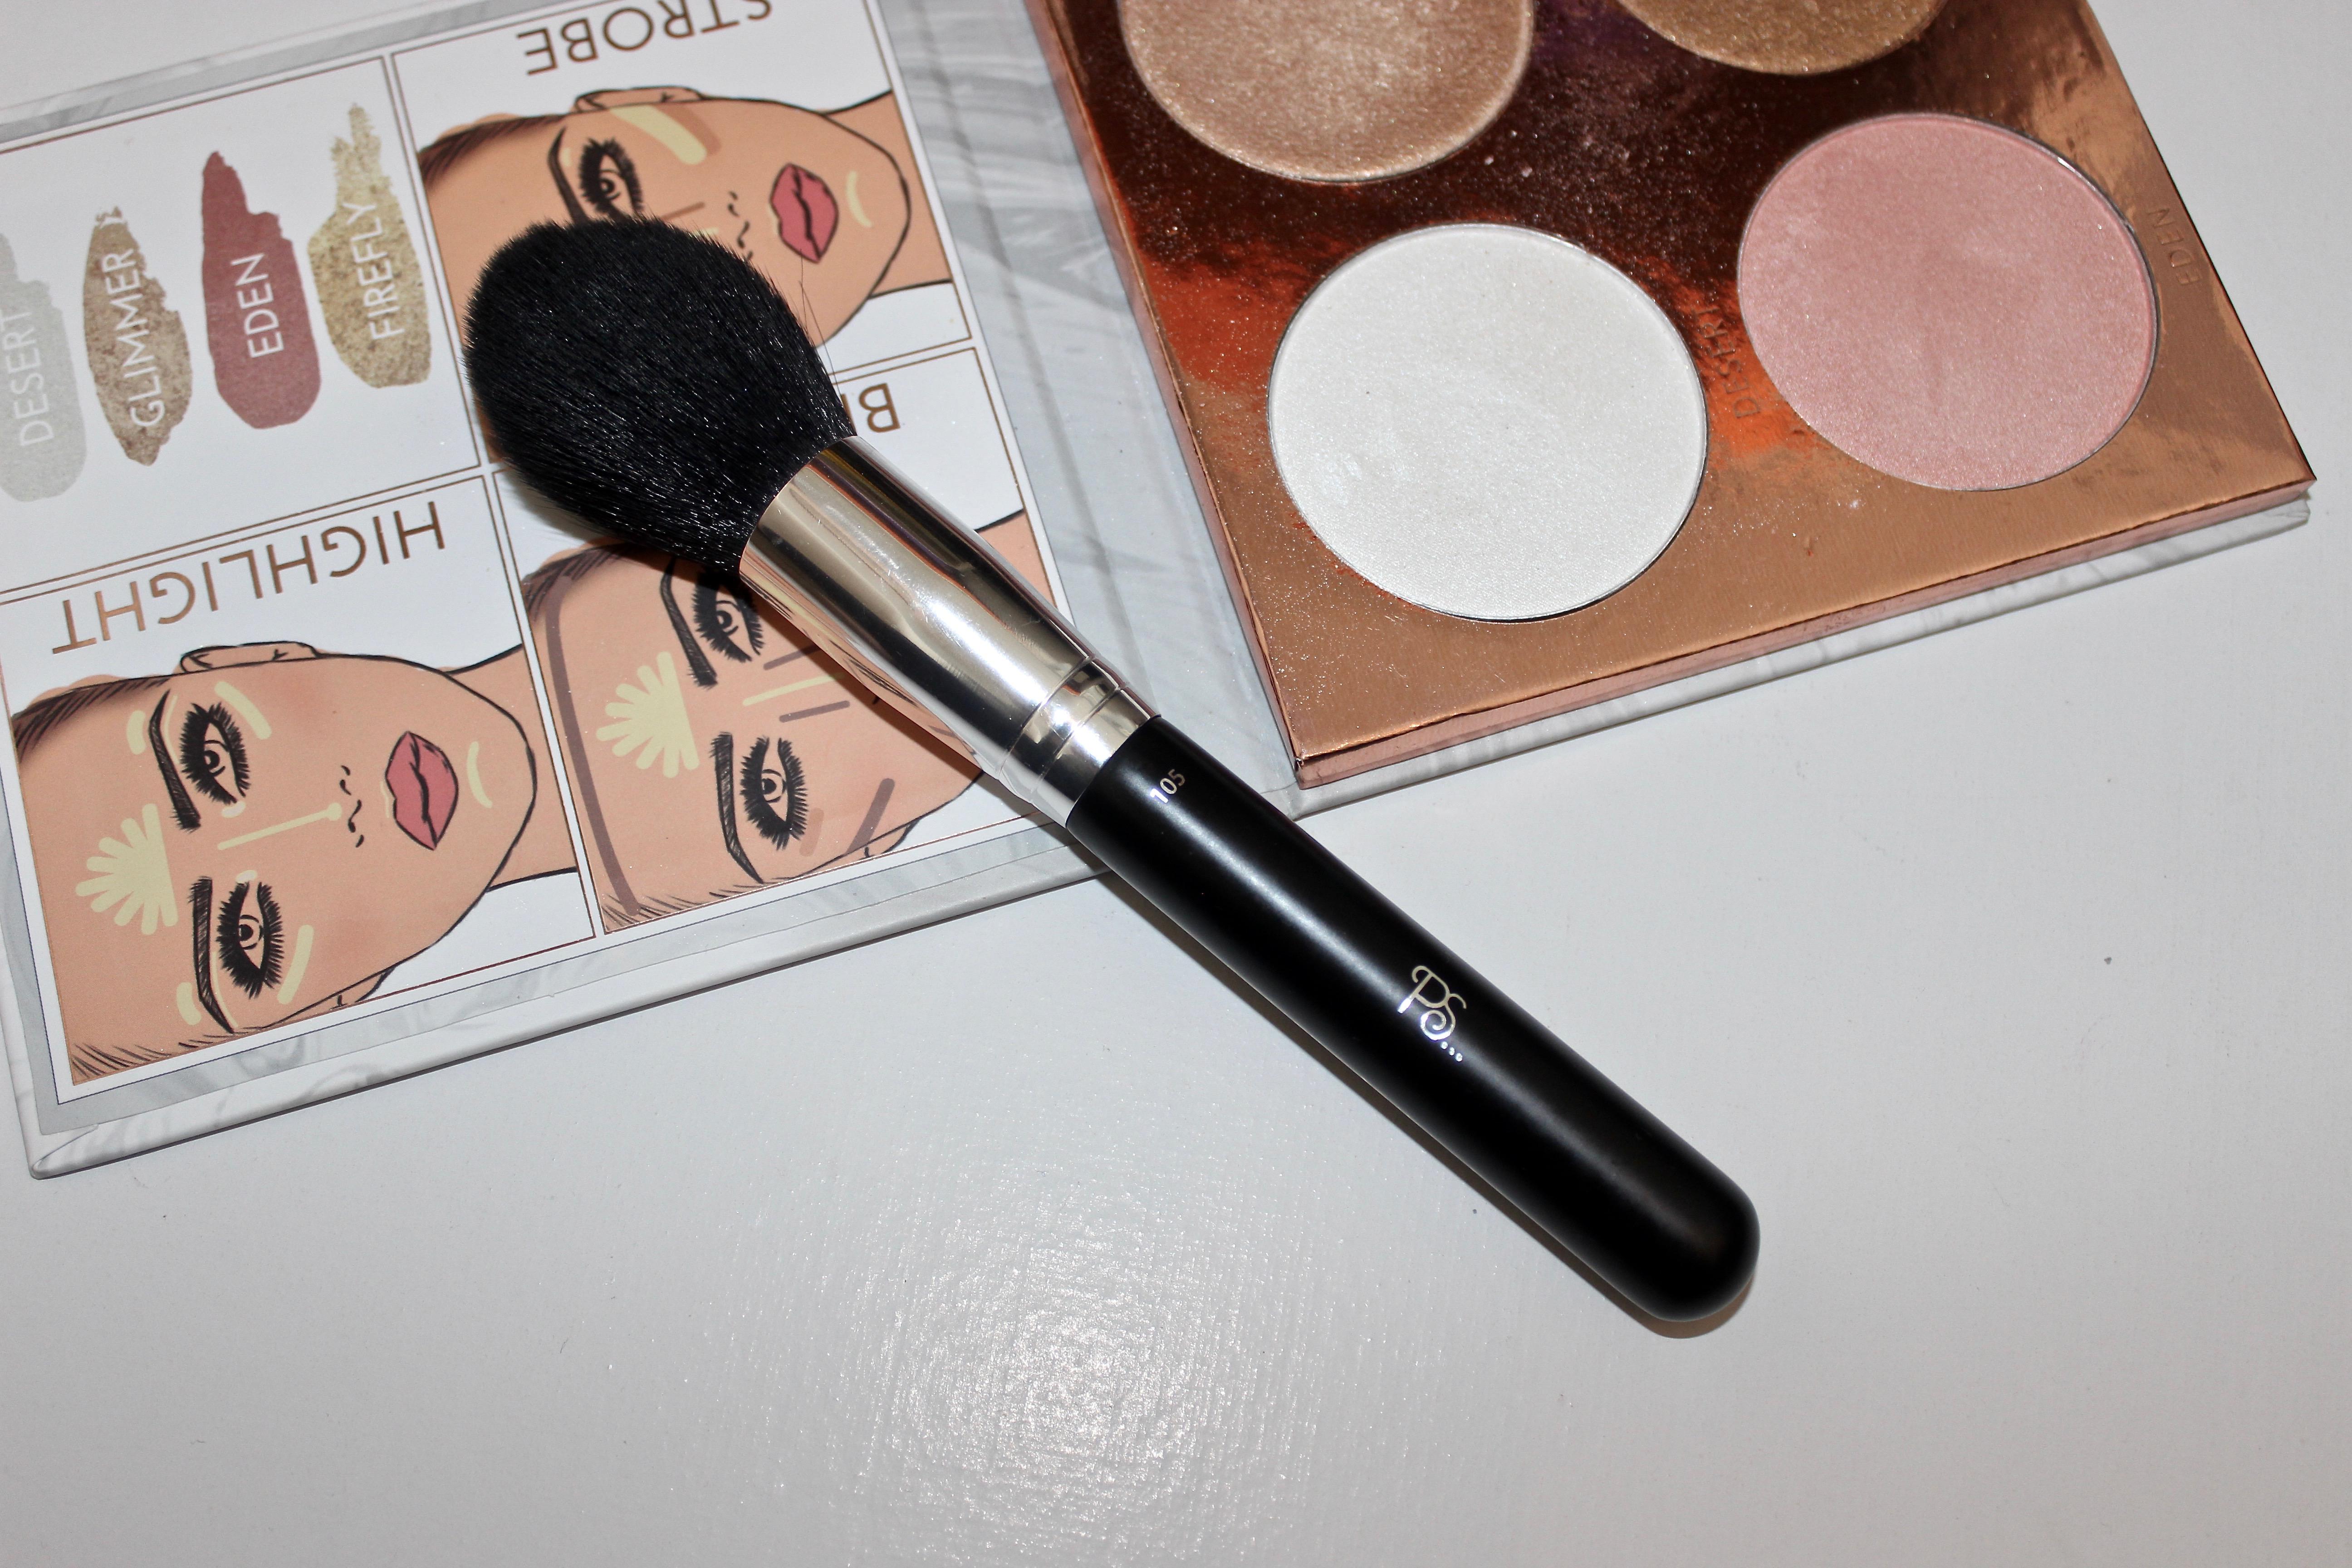 primark makeup brushes